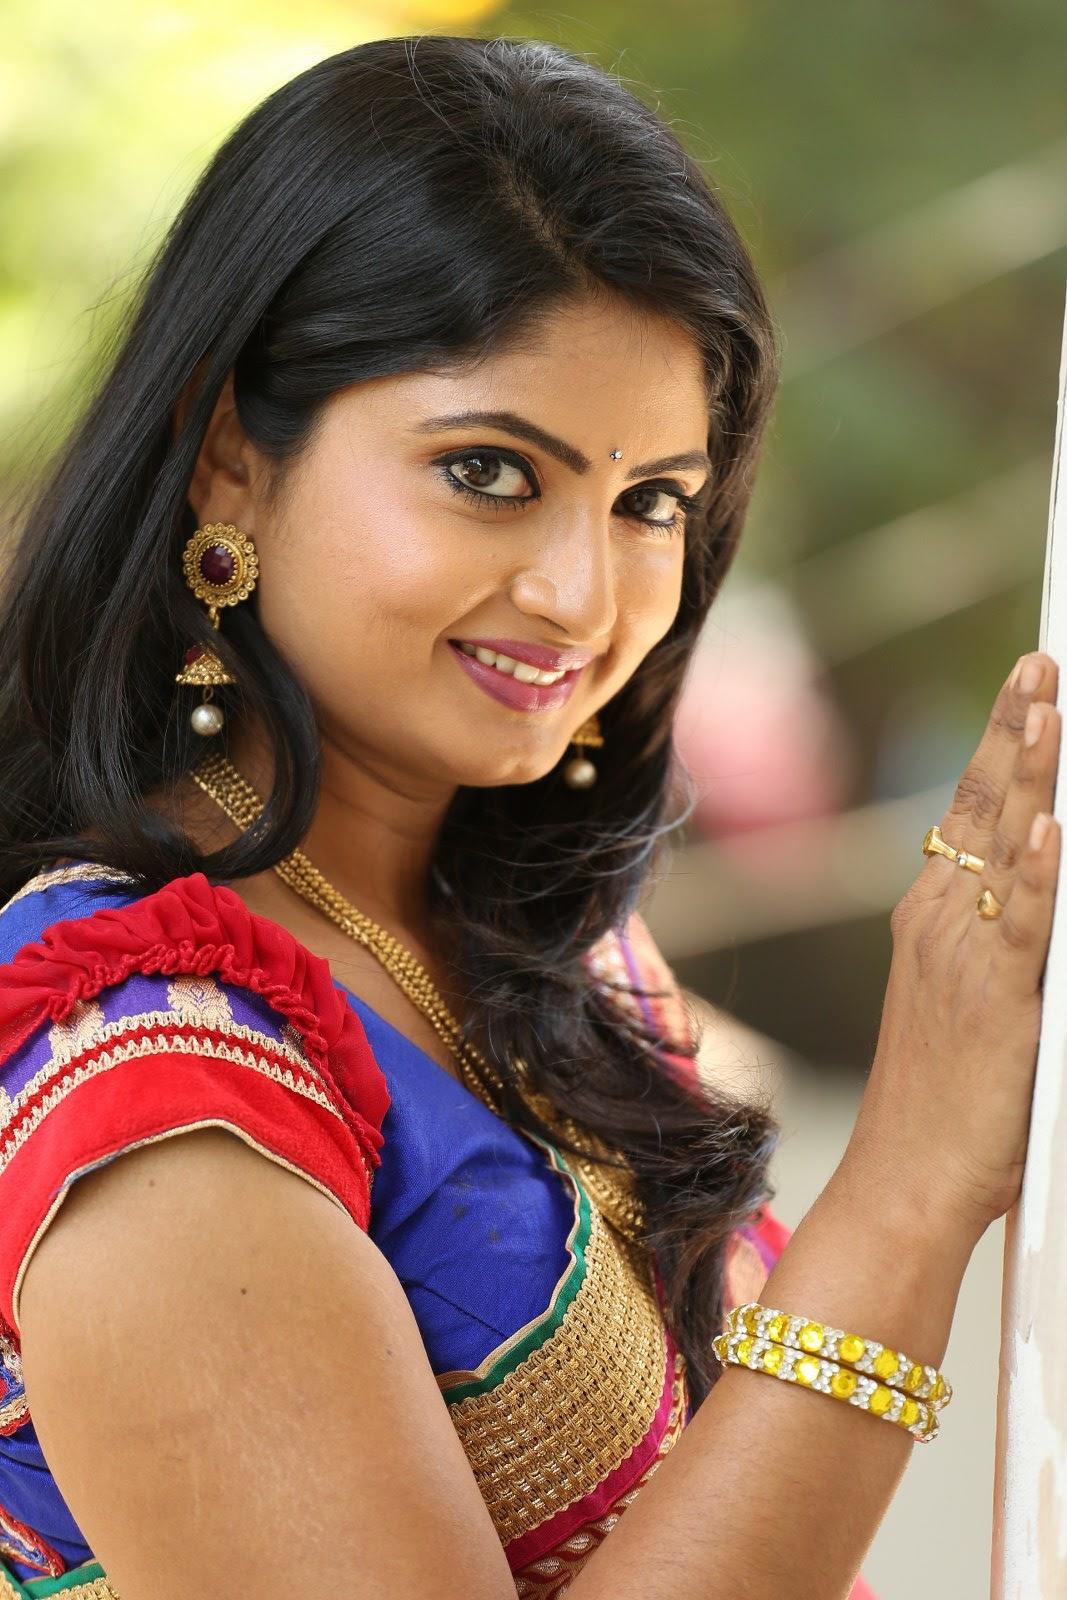 Telugu Serial Actress Sirisha Hot Photos ✓ Fitrini's Wallpaper